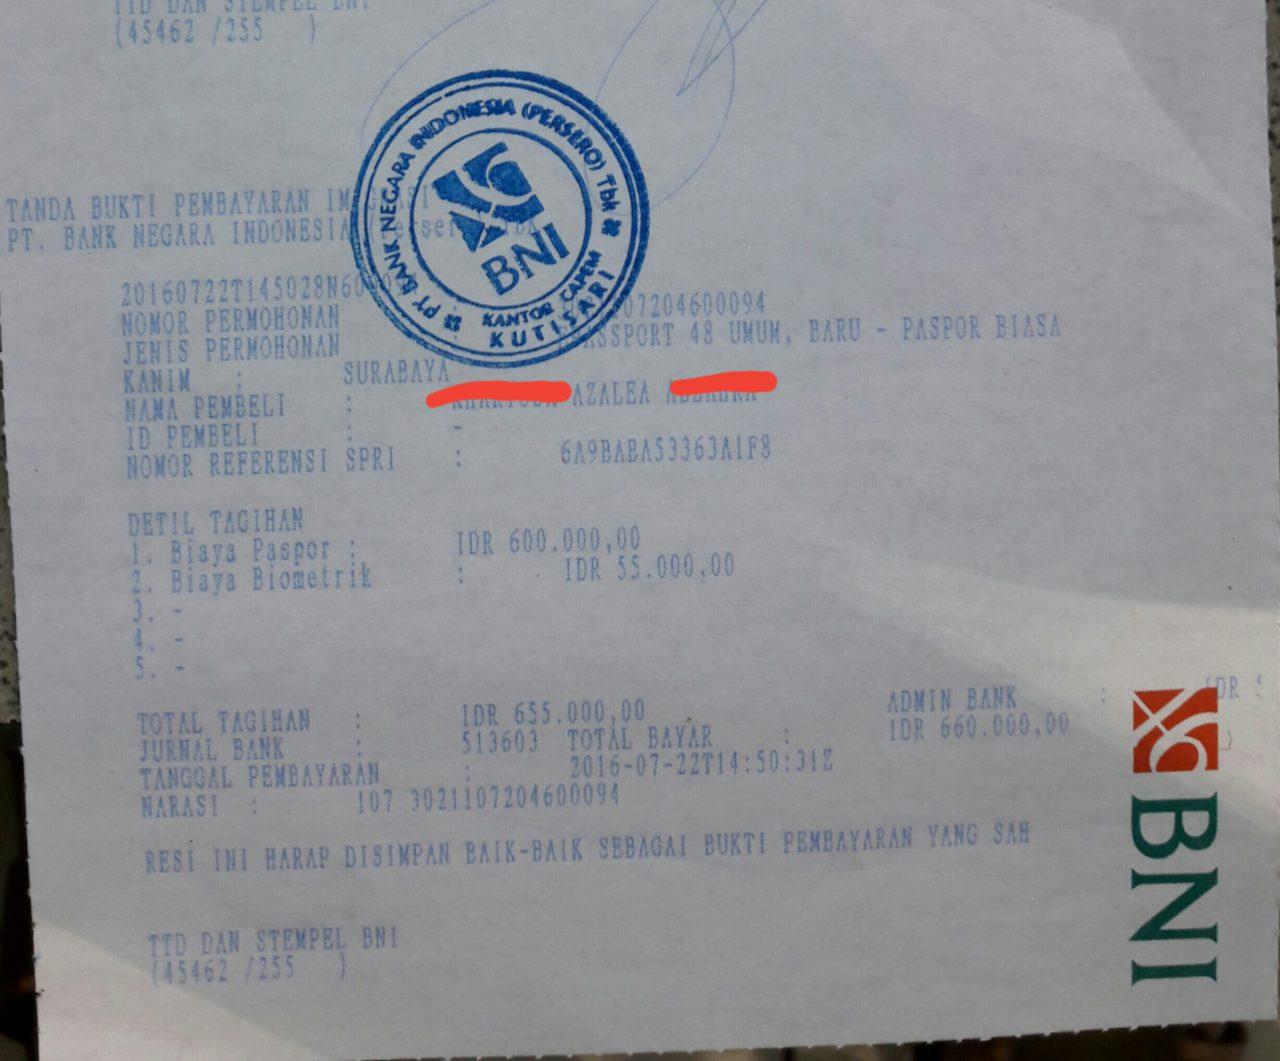 bukti pembayaran BNI e paspor anak surabaya